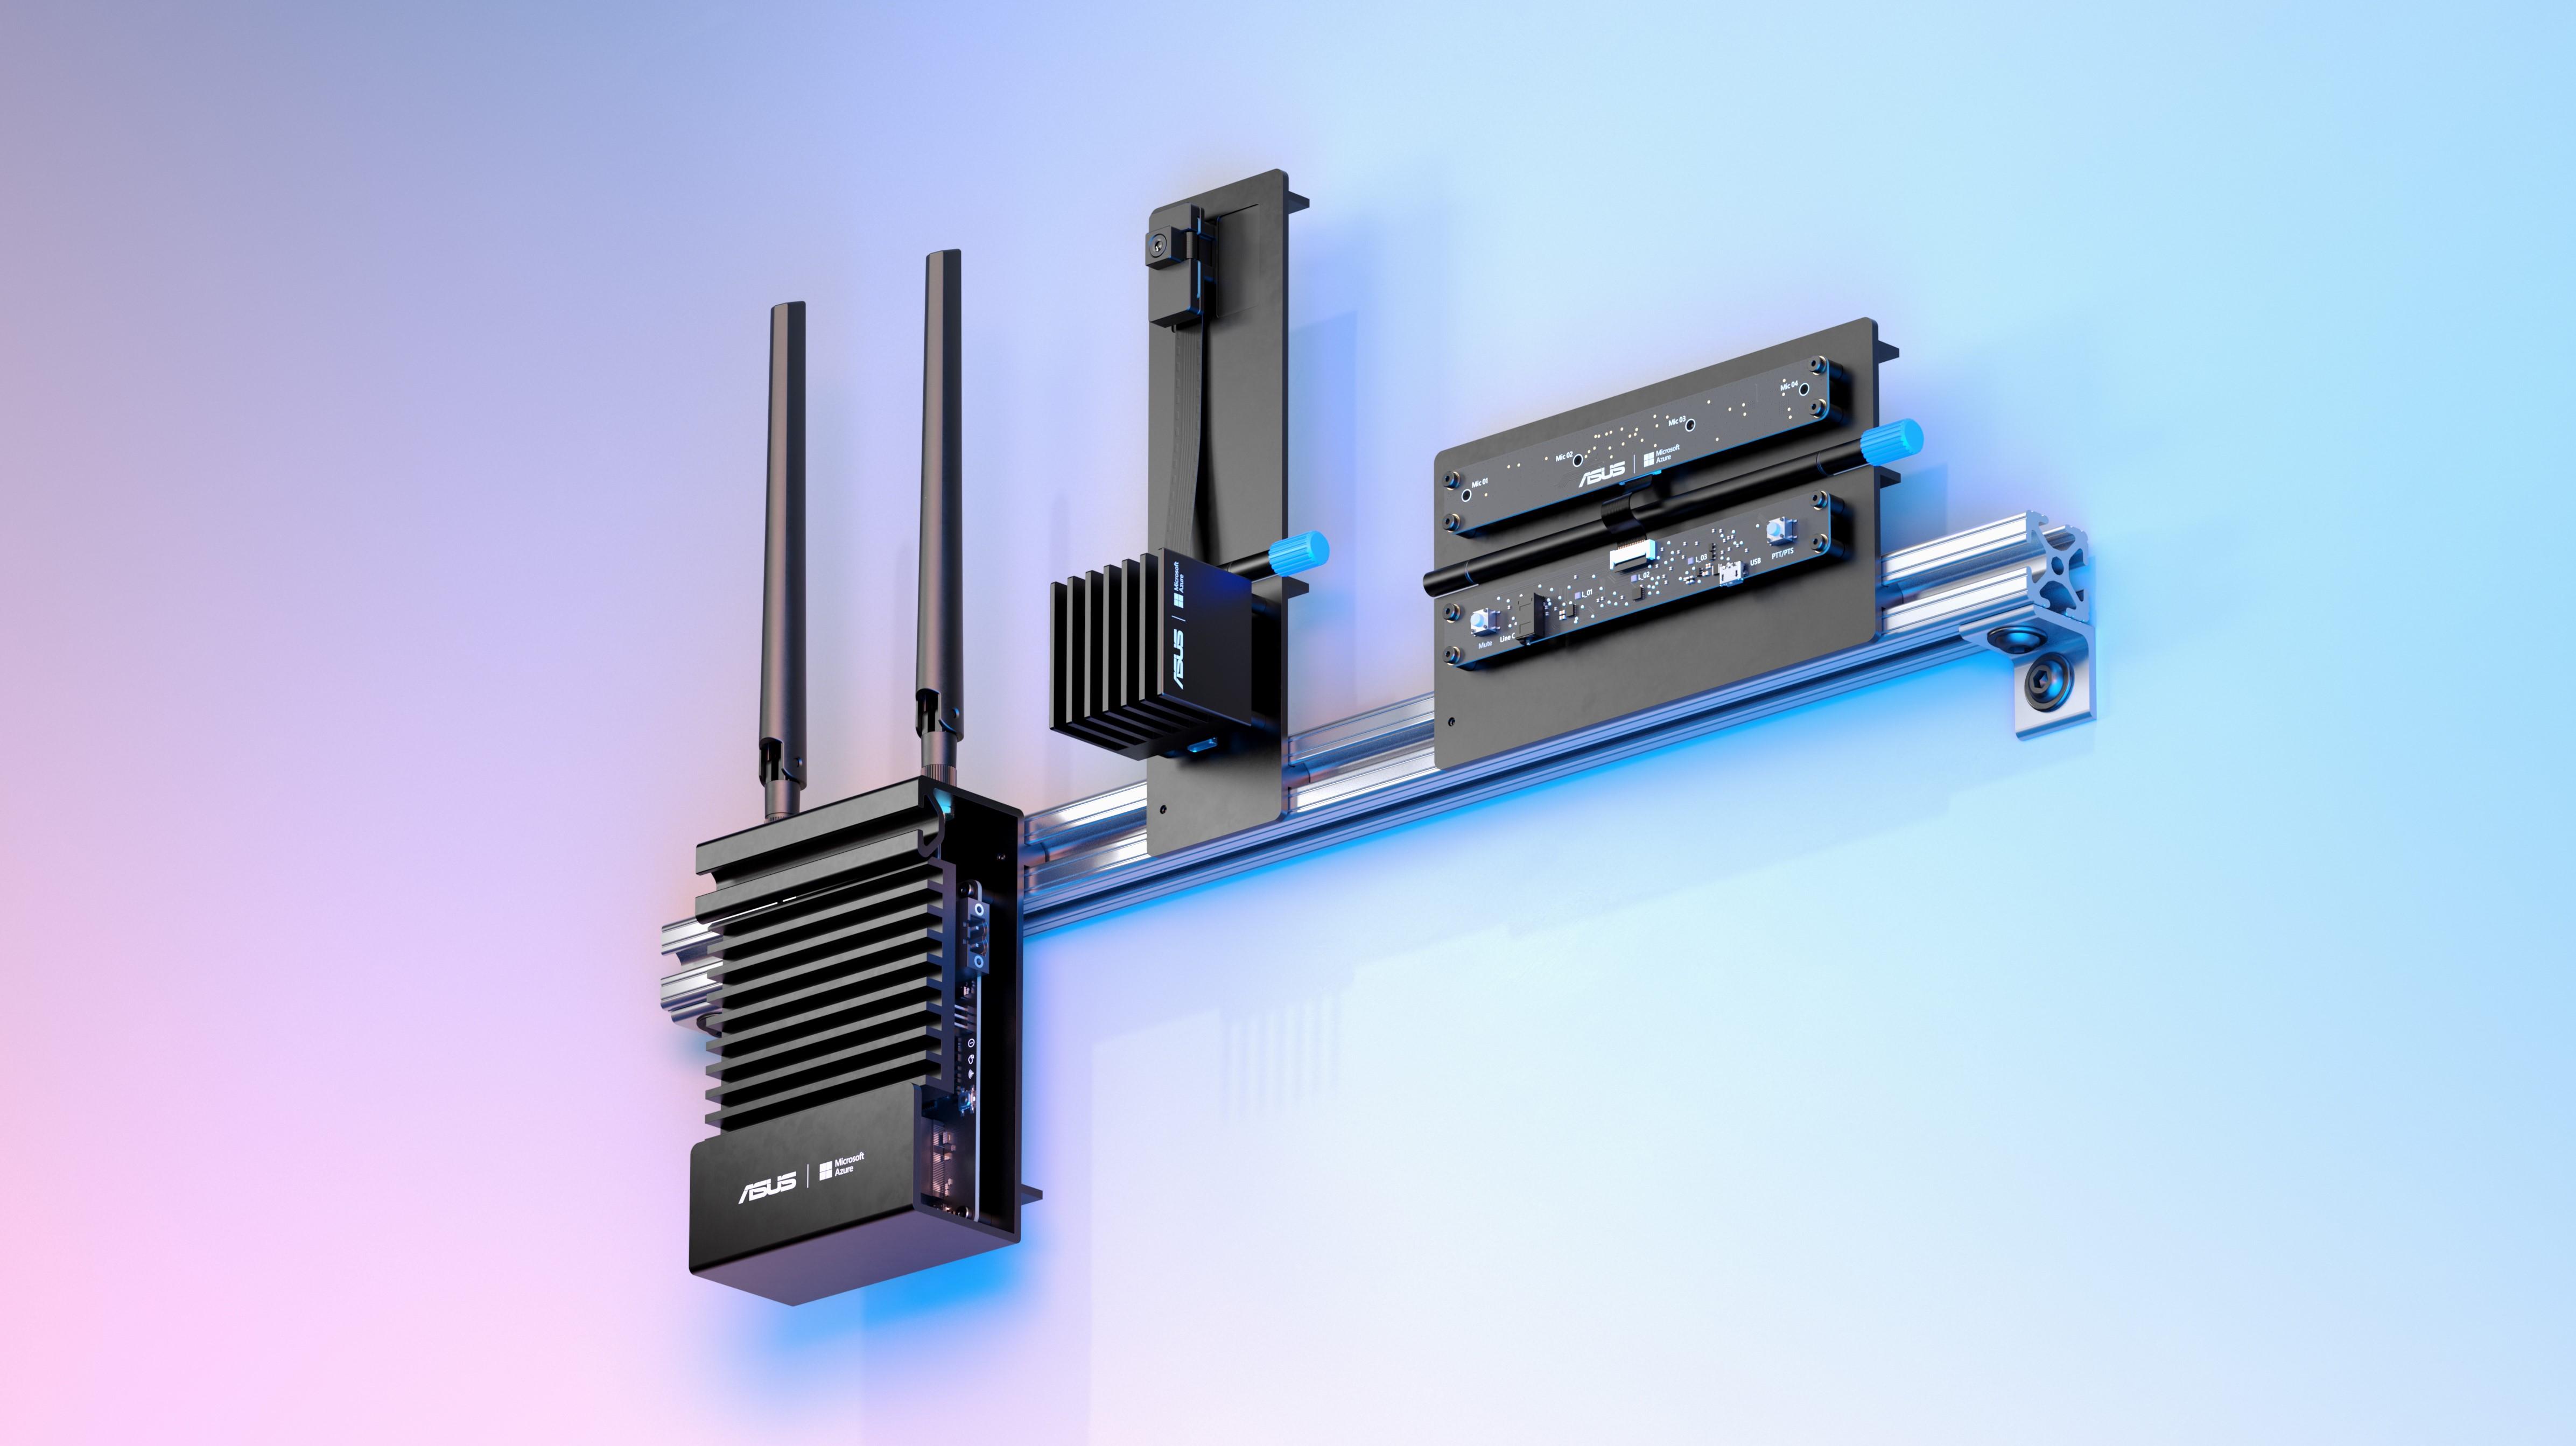 Azure Percept devices, including Trust Platform Module, Azure Percept Vision and Azure Percept Audio